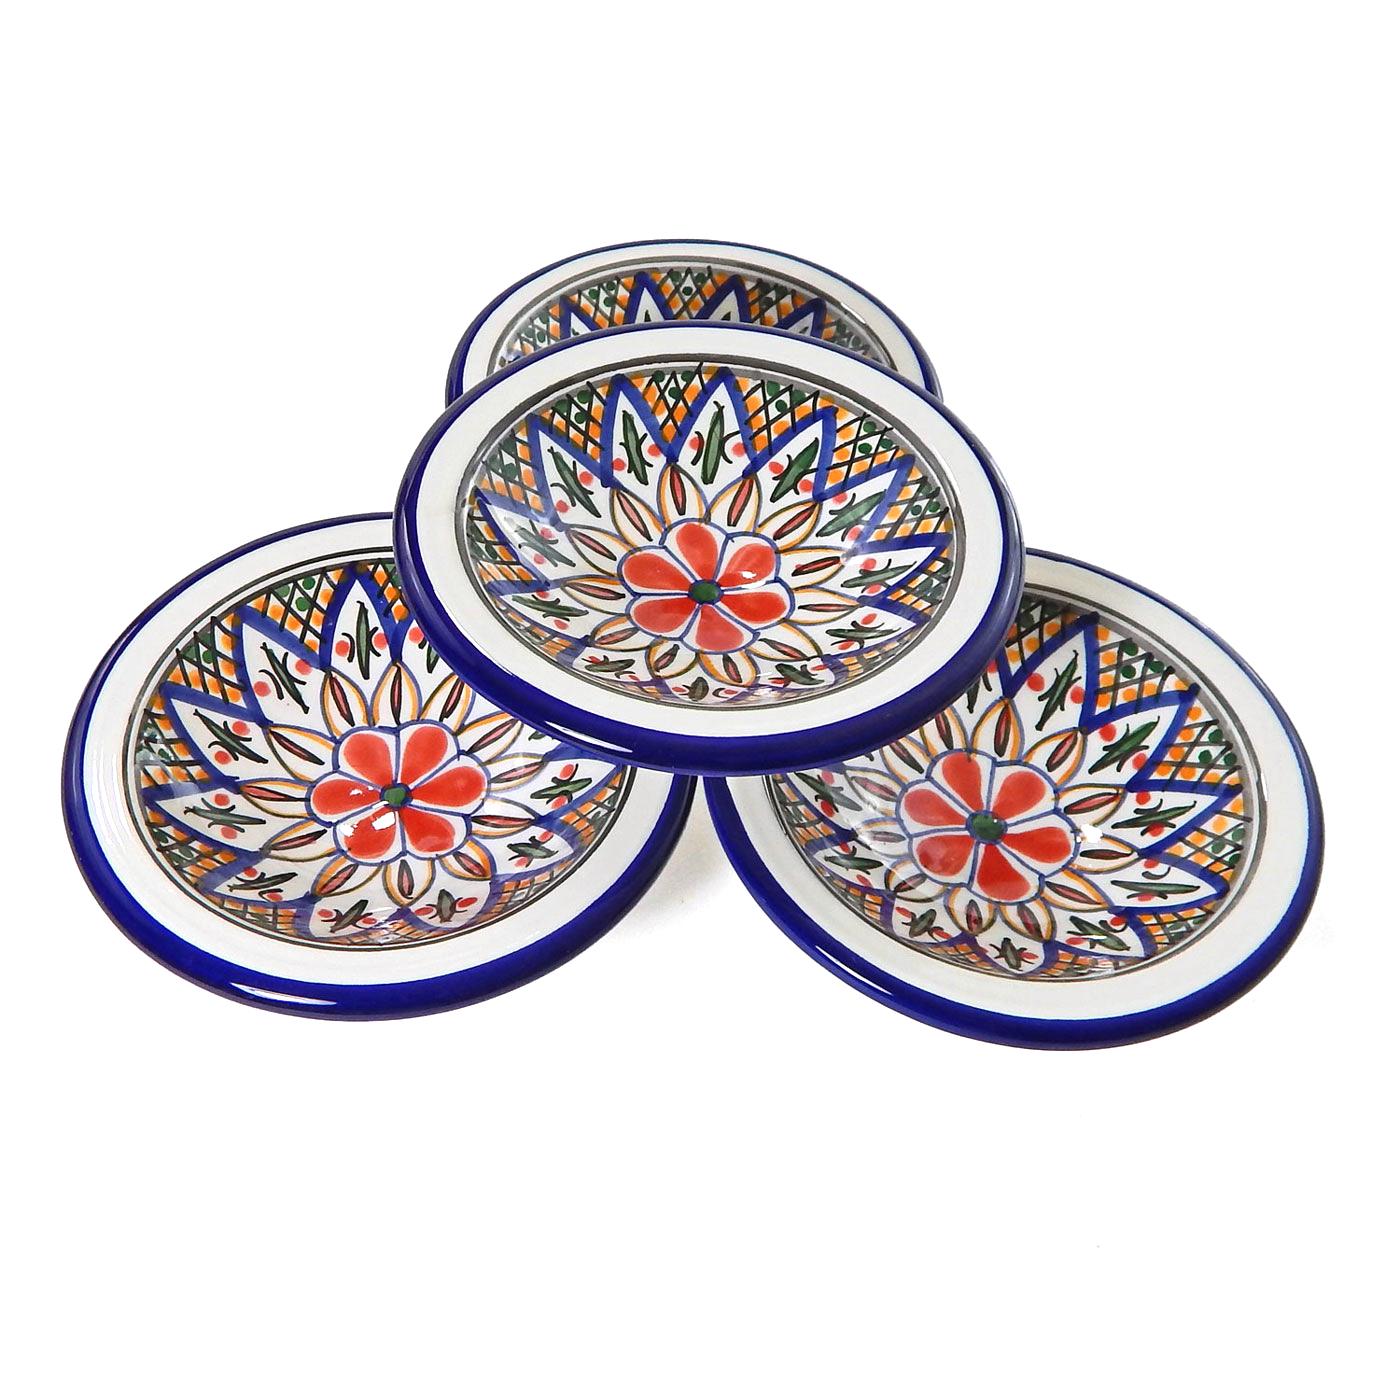 Le Souk Ceramique Tabarka Round Sauce Dish, Set of 4